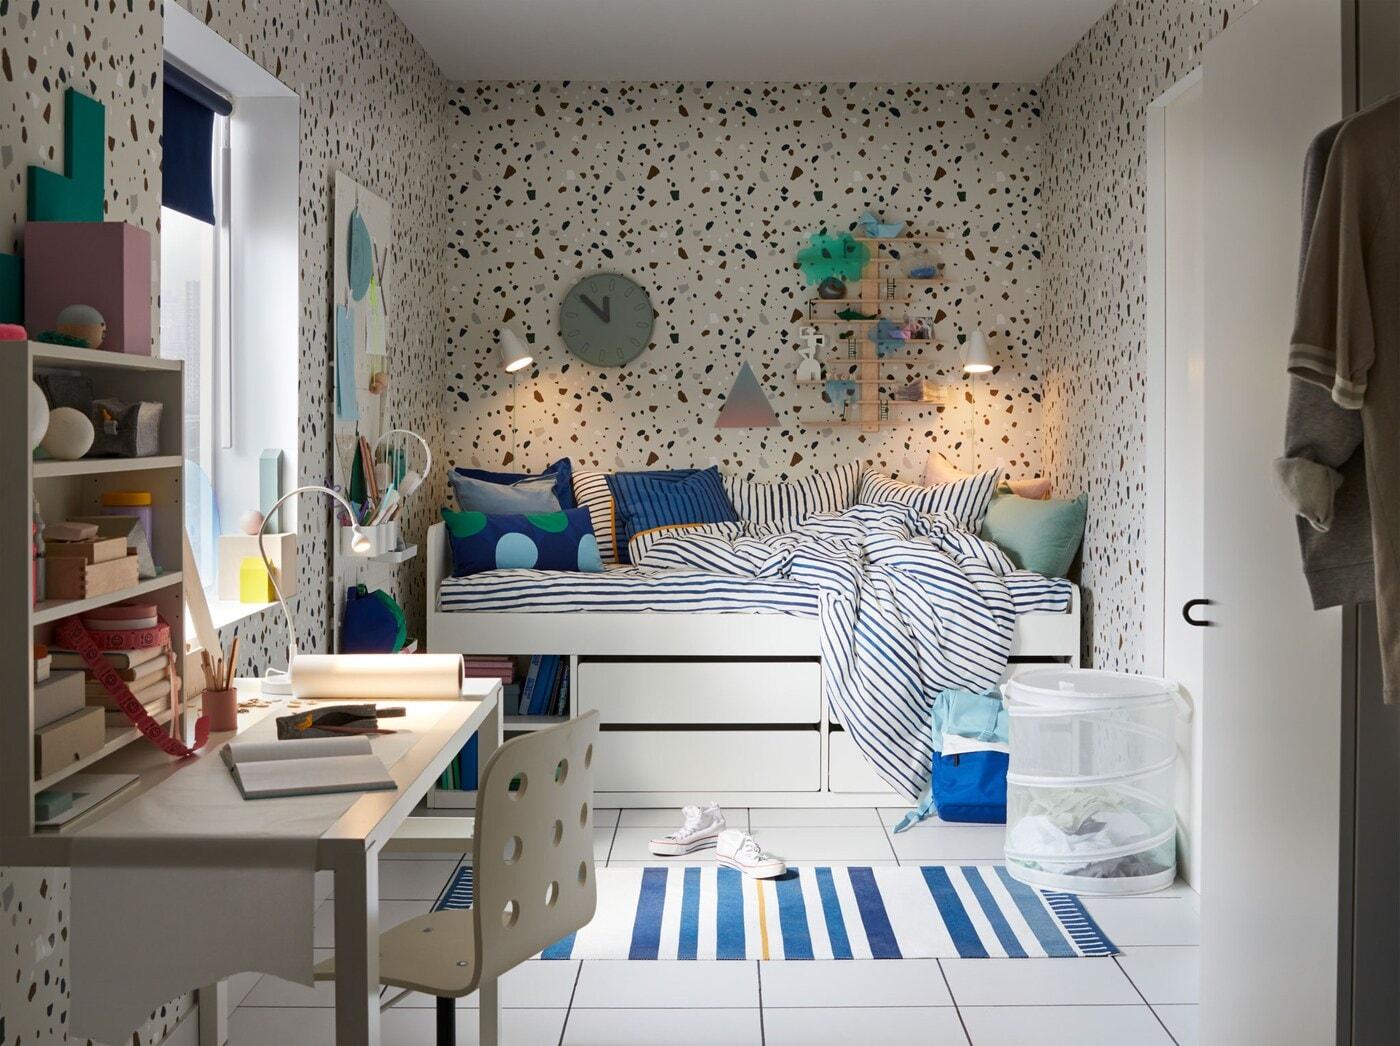 Cooles Kinderzimmer In Blau